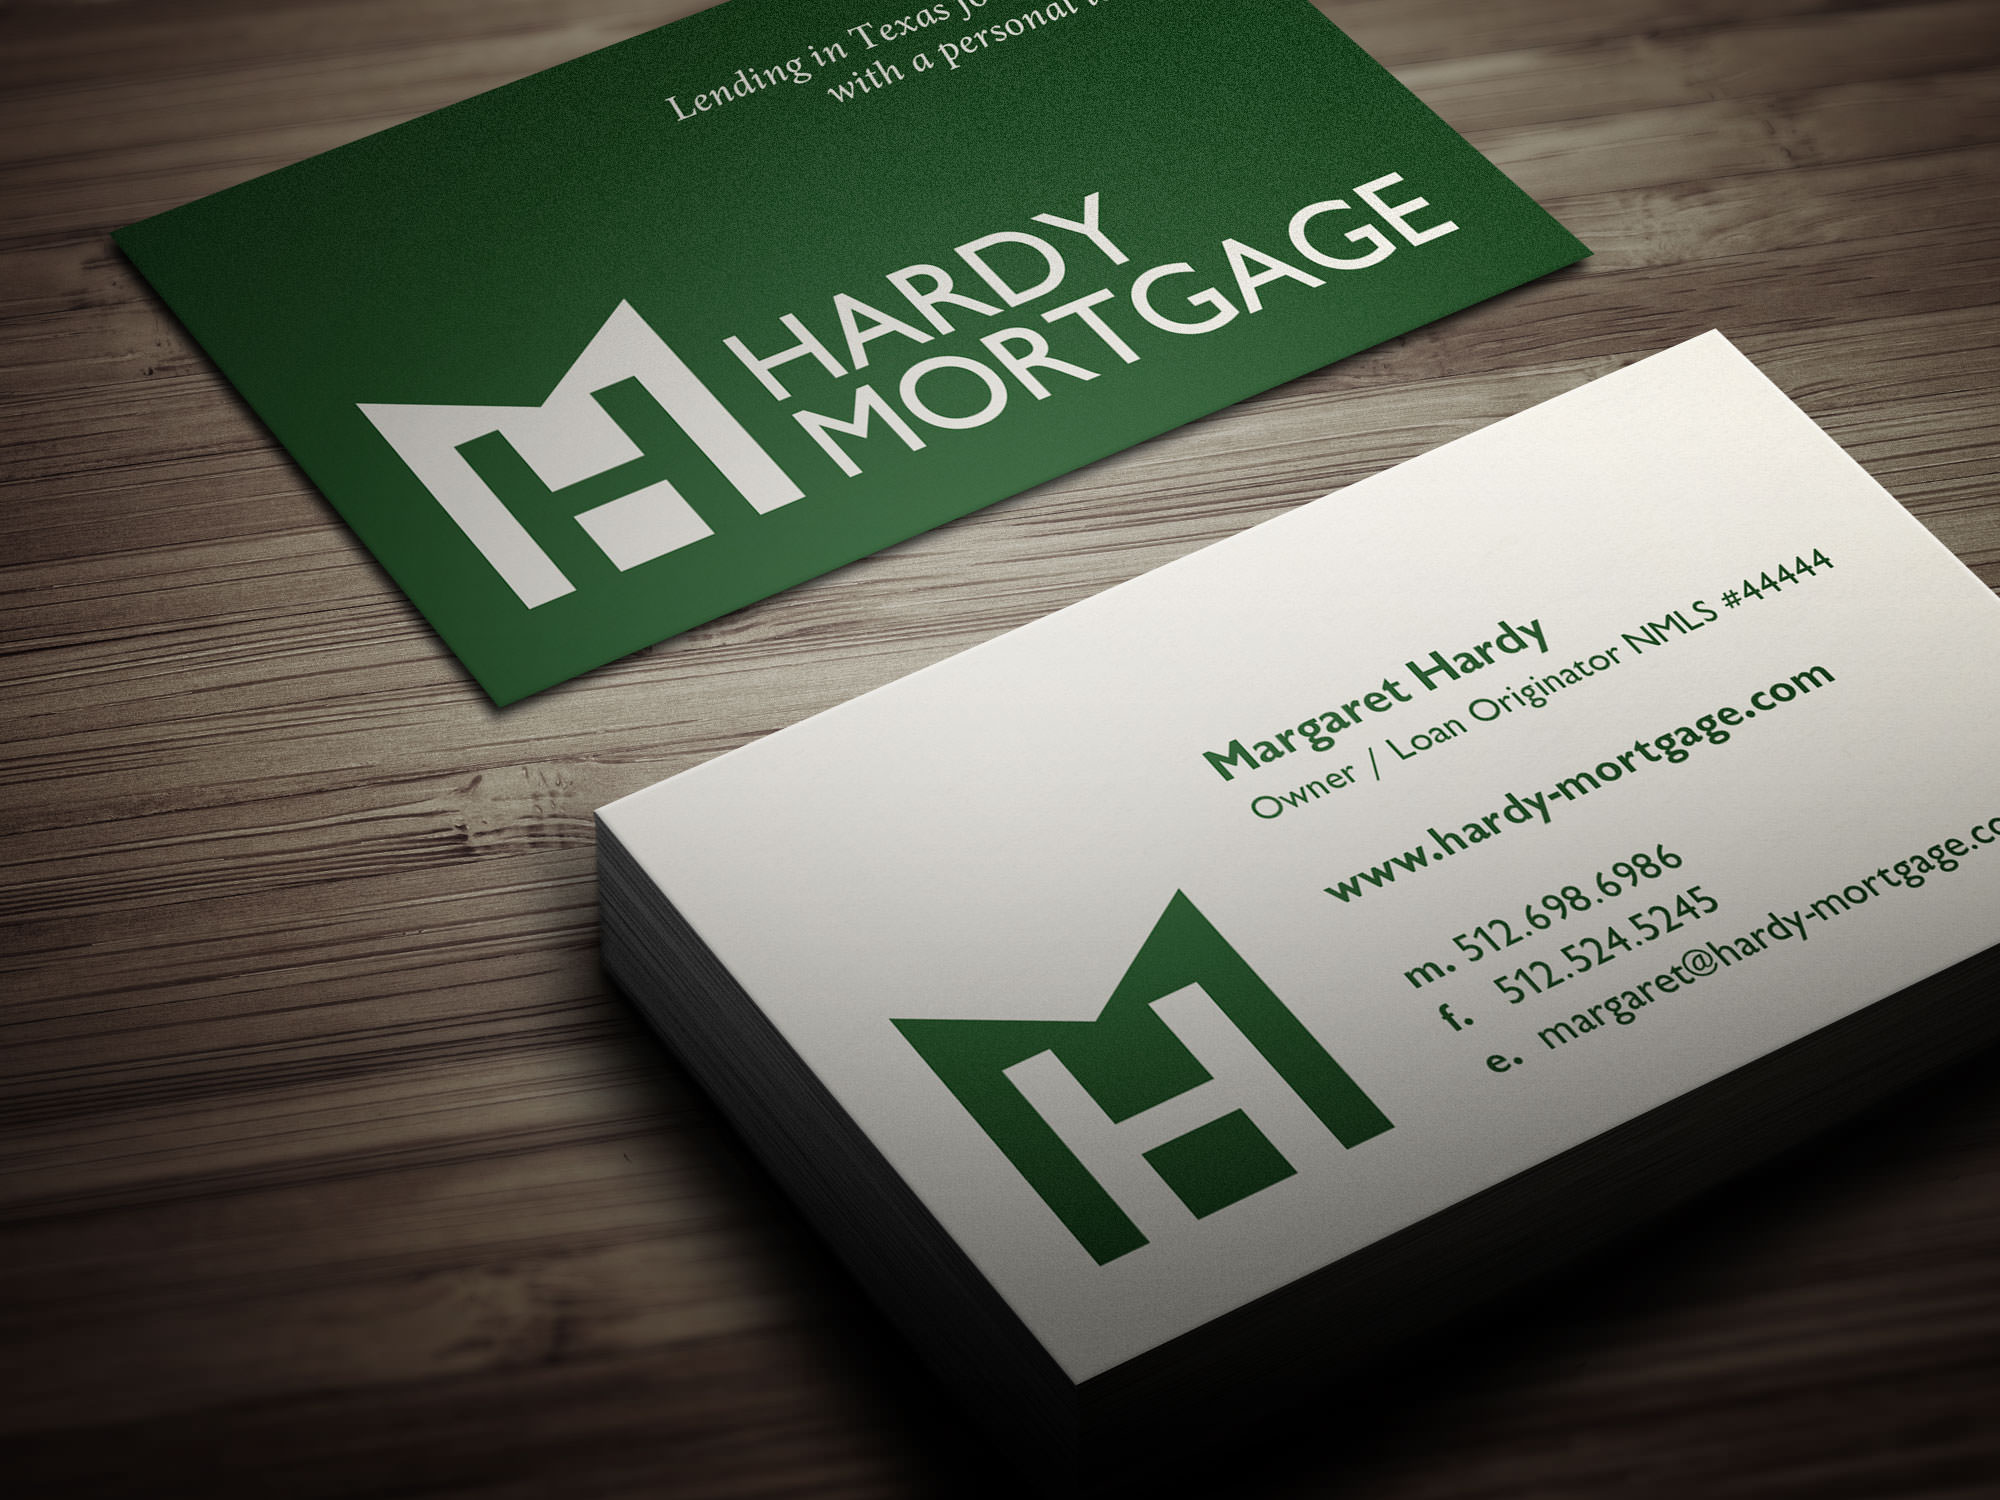 hardy mortgage james benavides